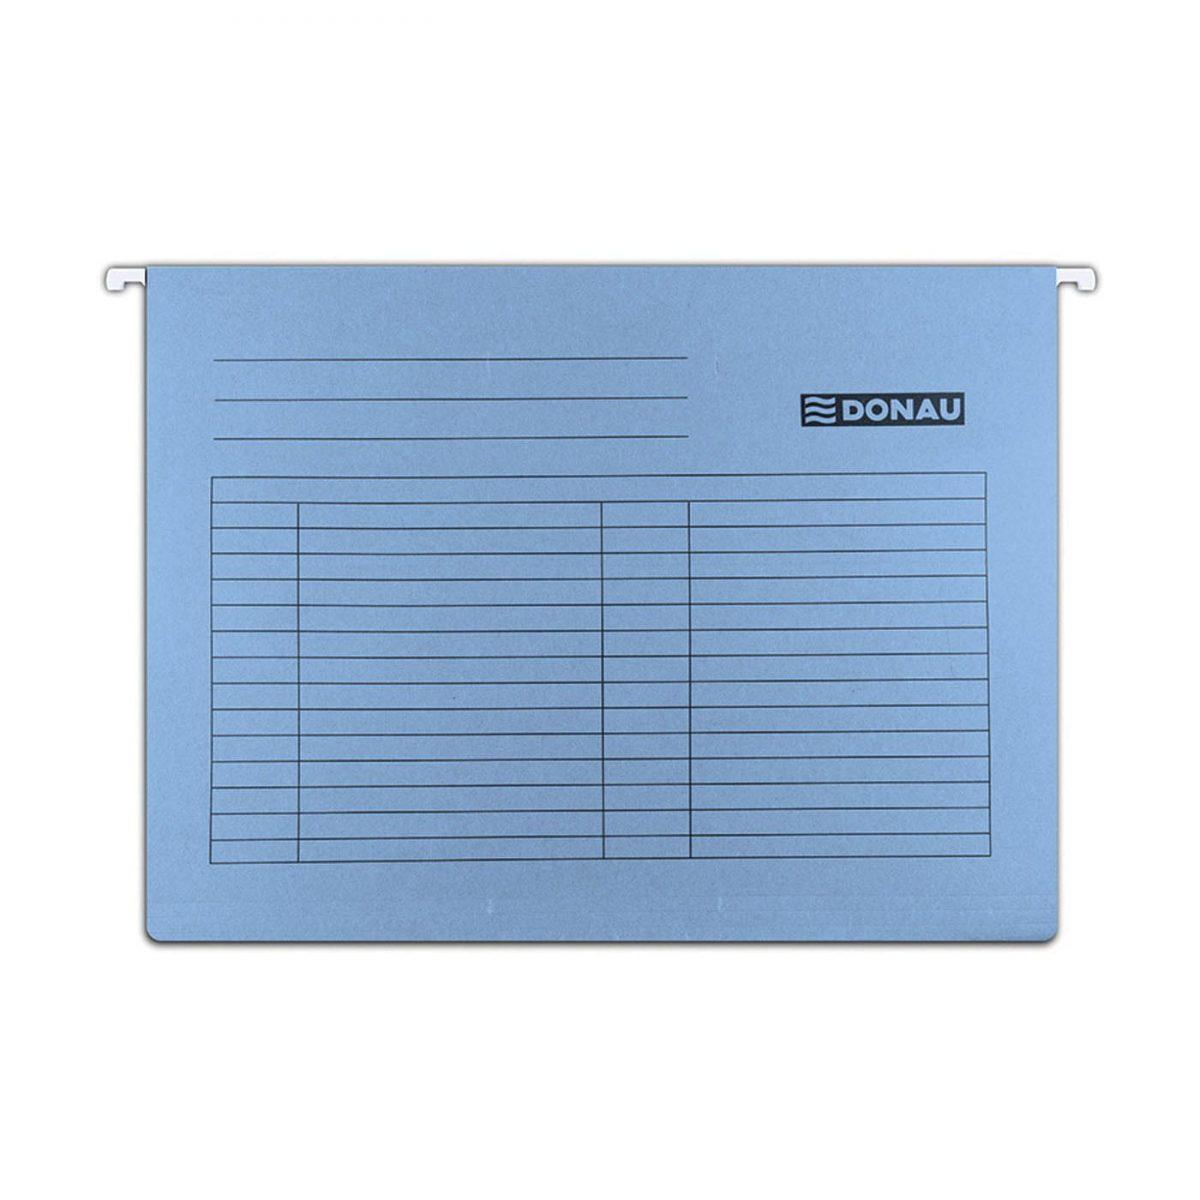 Dosar suspendabil cu eticheta, bagheta metalica, carton 230g/mp, 5 buc/set, DONAU